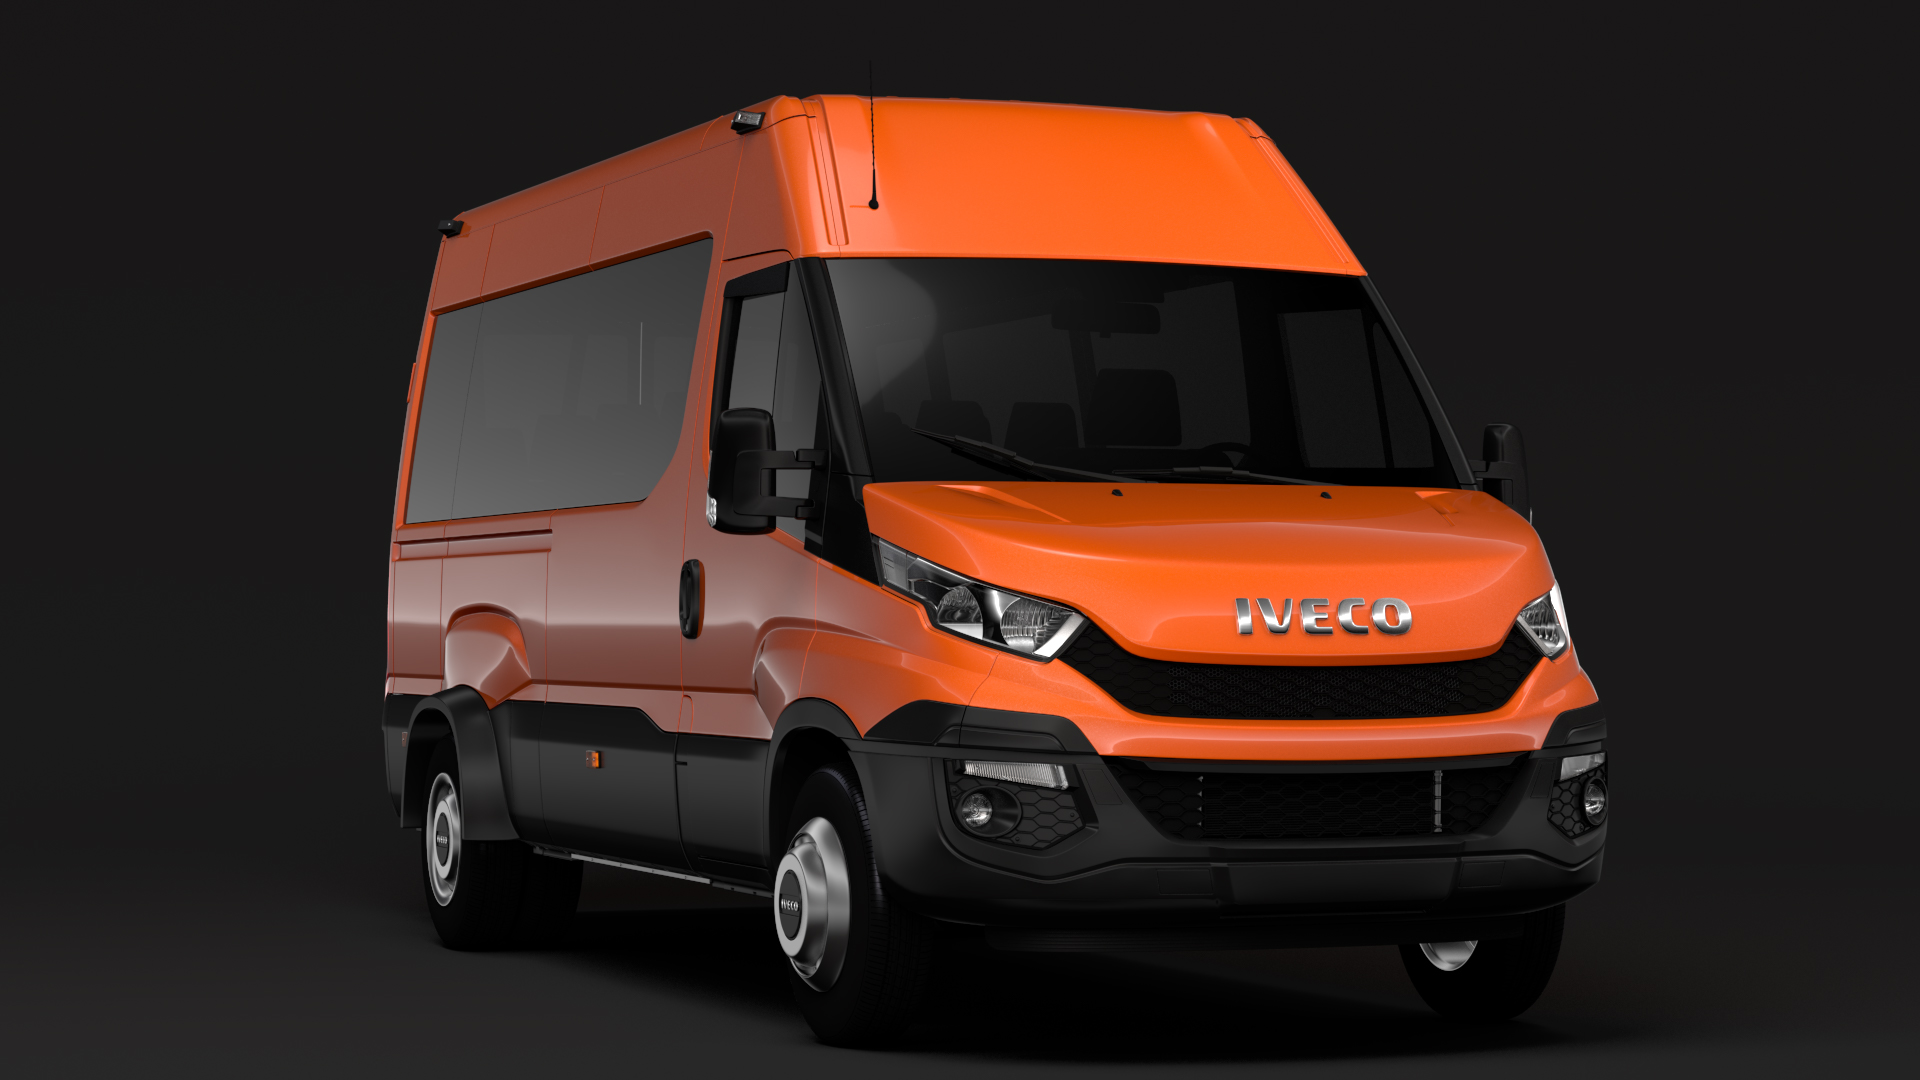 iveco daily minibus l3h2 2014-2016 3d model max fbx c4d lwo ma mb hrc xsi obj 276044